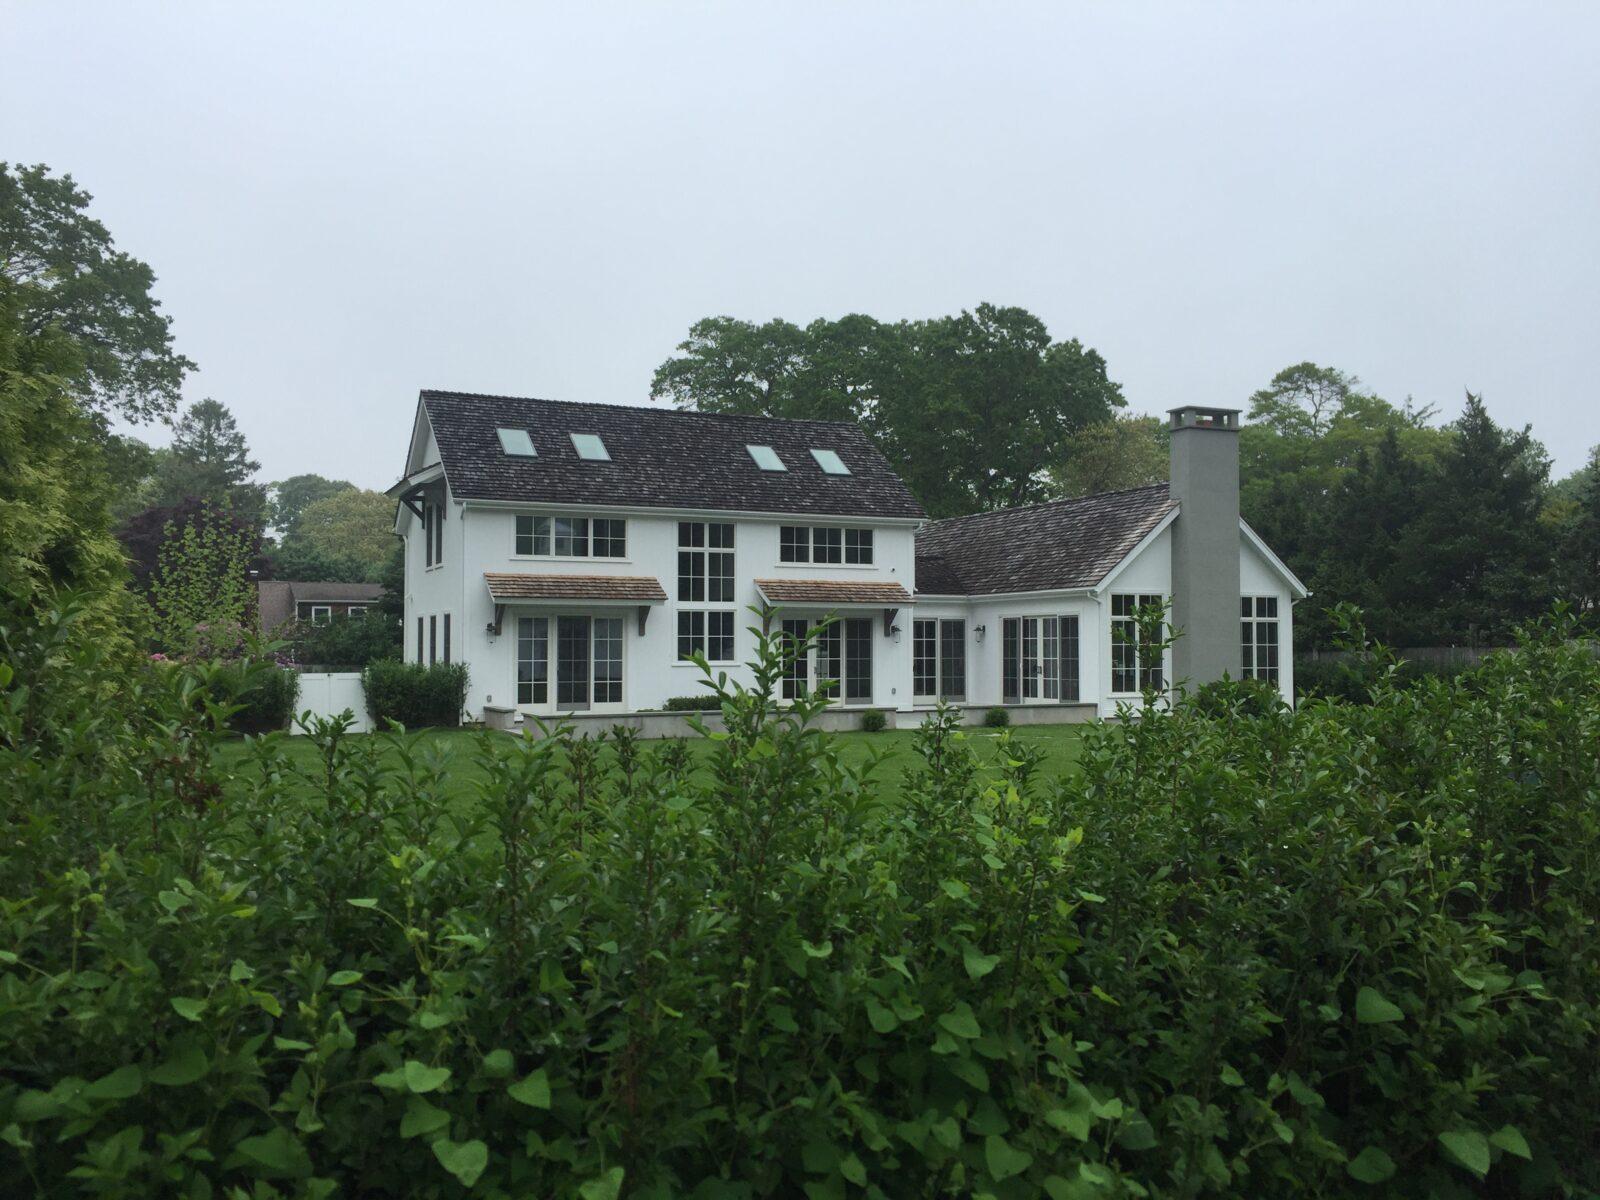 Homes that look like barns - Tisbury